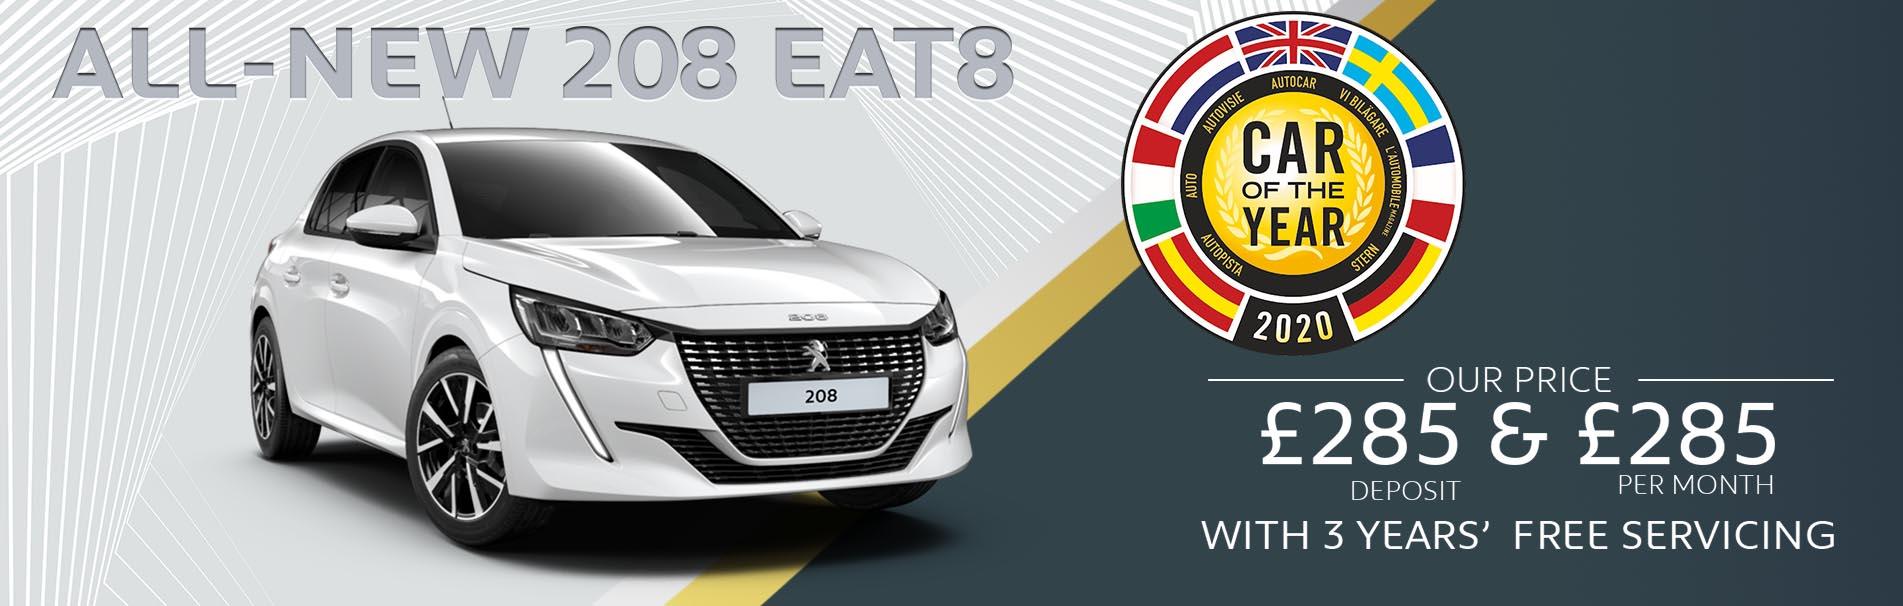 peugeot-all-new-208-allure-eat8-automatic-pcp-price-sli